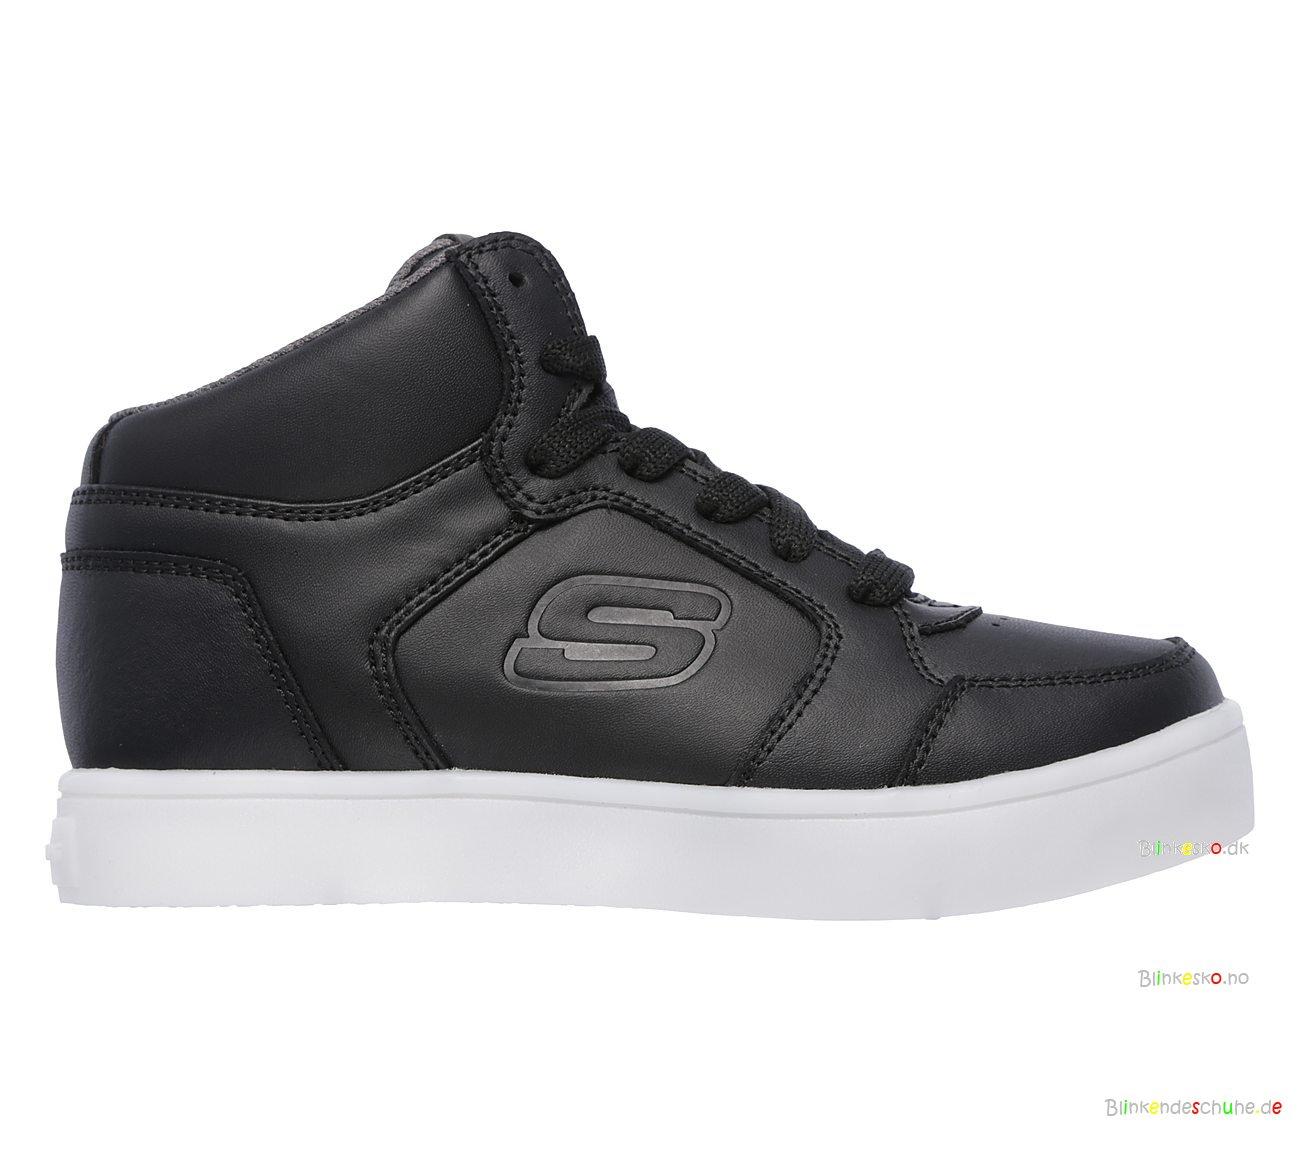 Skechers Baby Boy Shoes